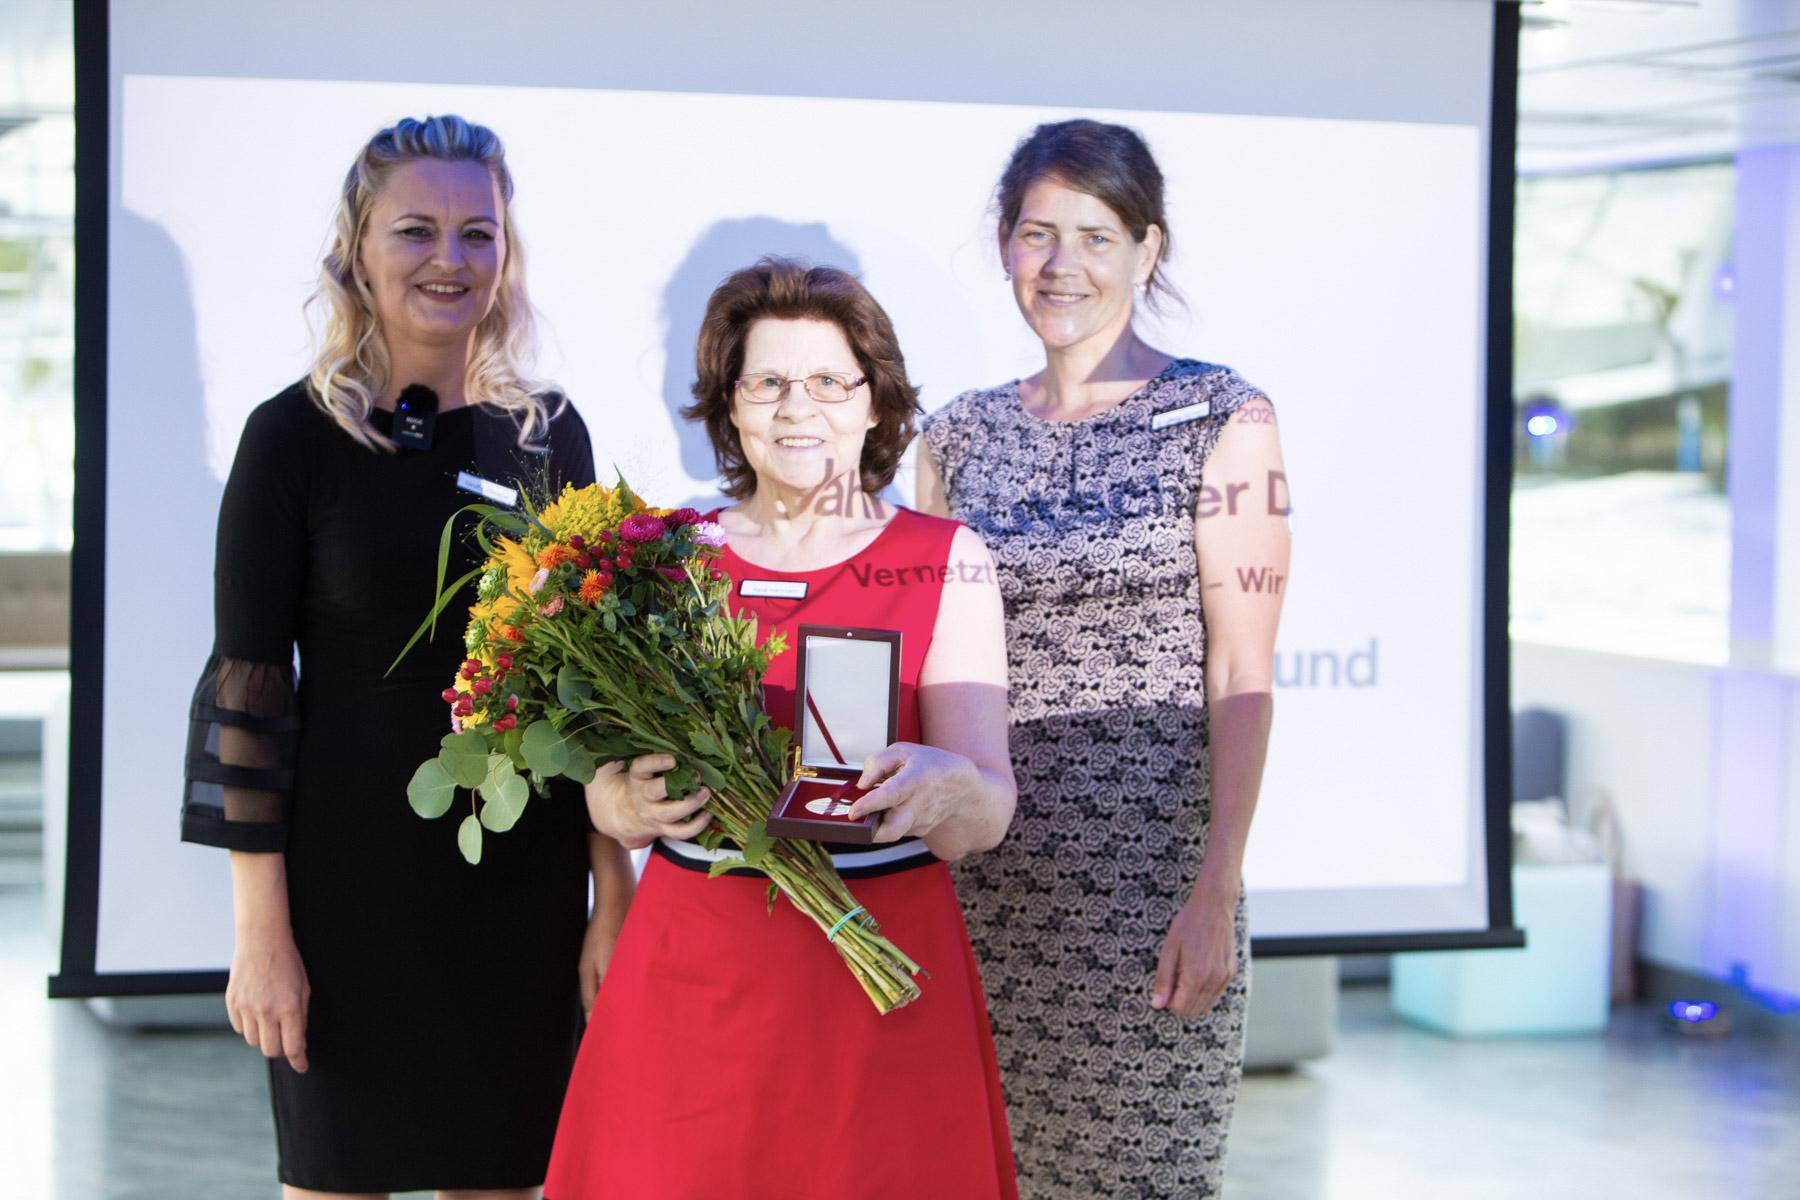 Heidi Hartmann, Sandra Schneller, Anne Seubert |©Gesine Born